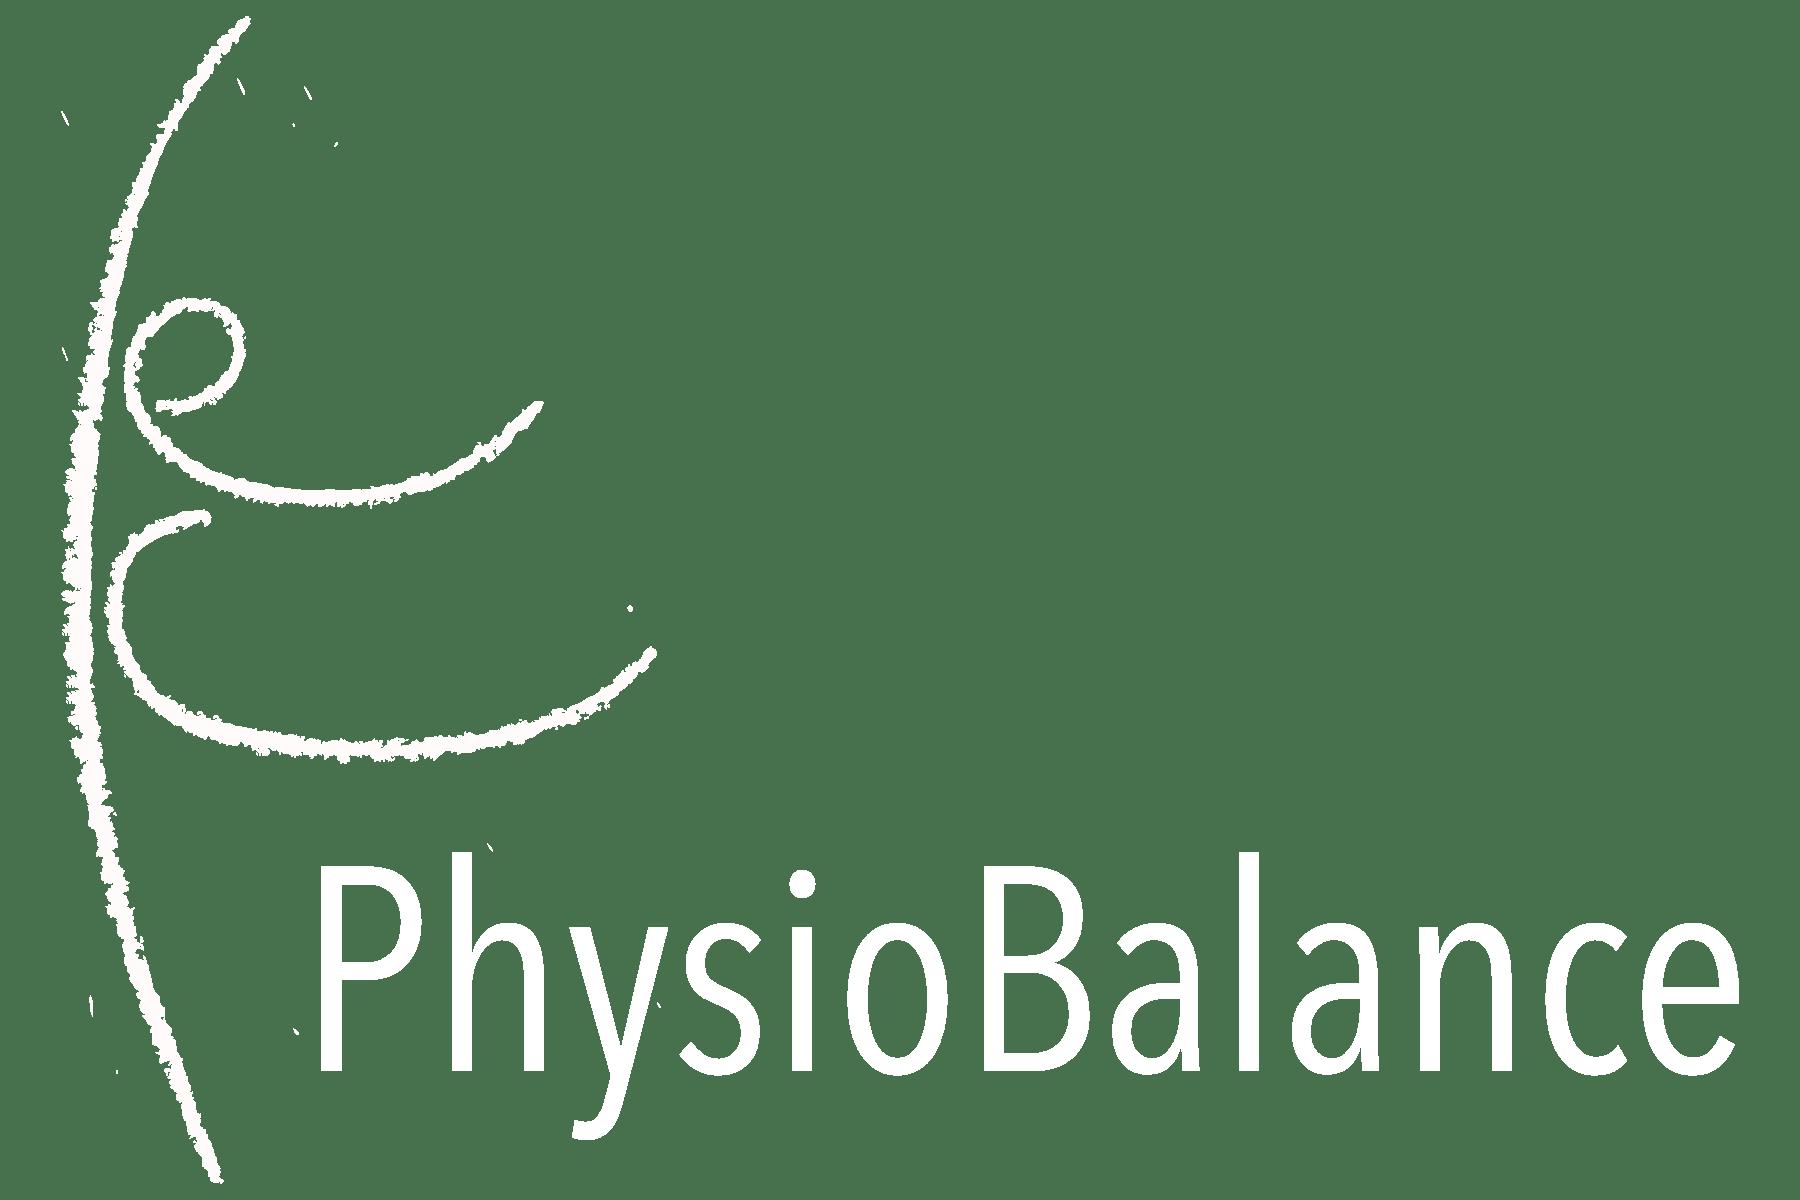 PhysioBalance